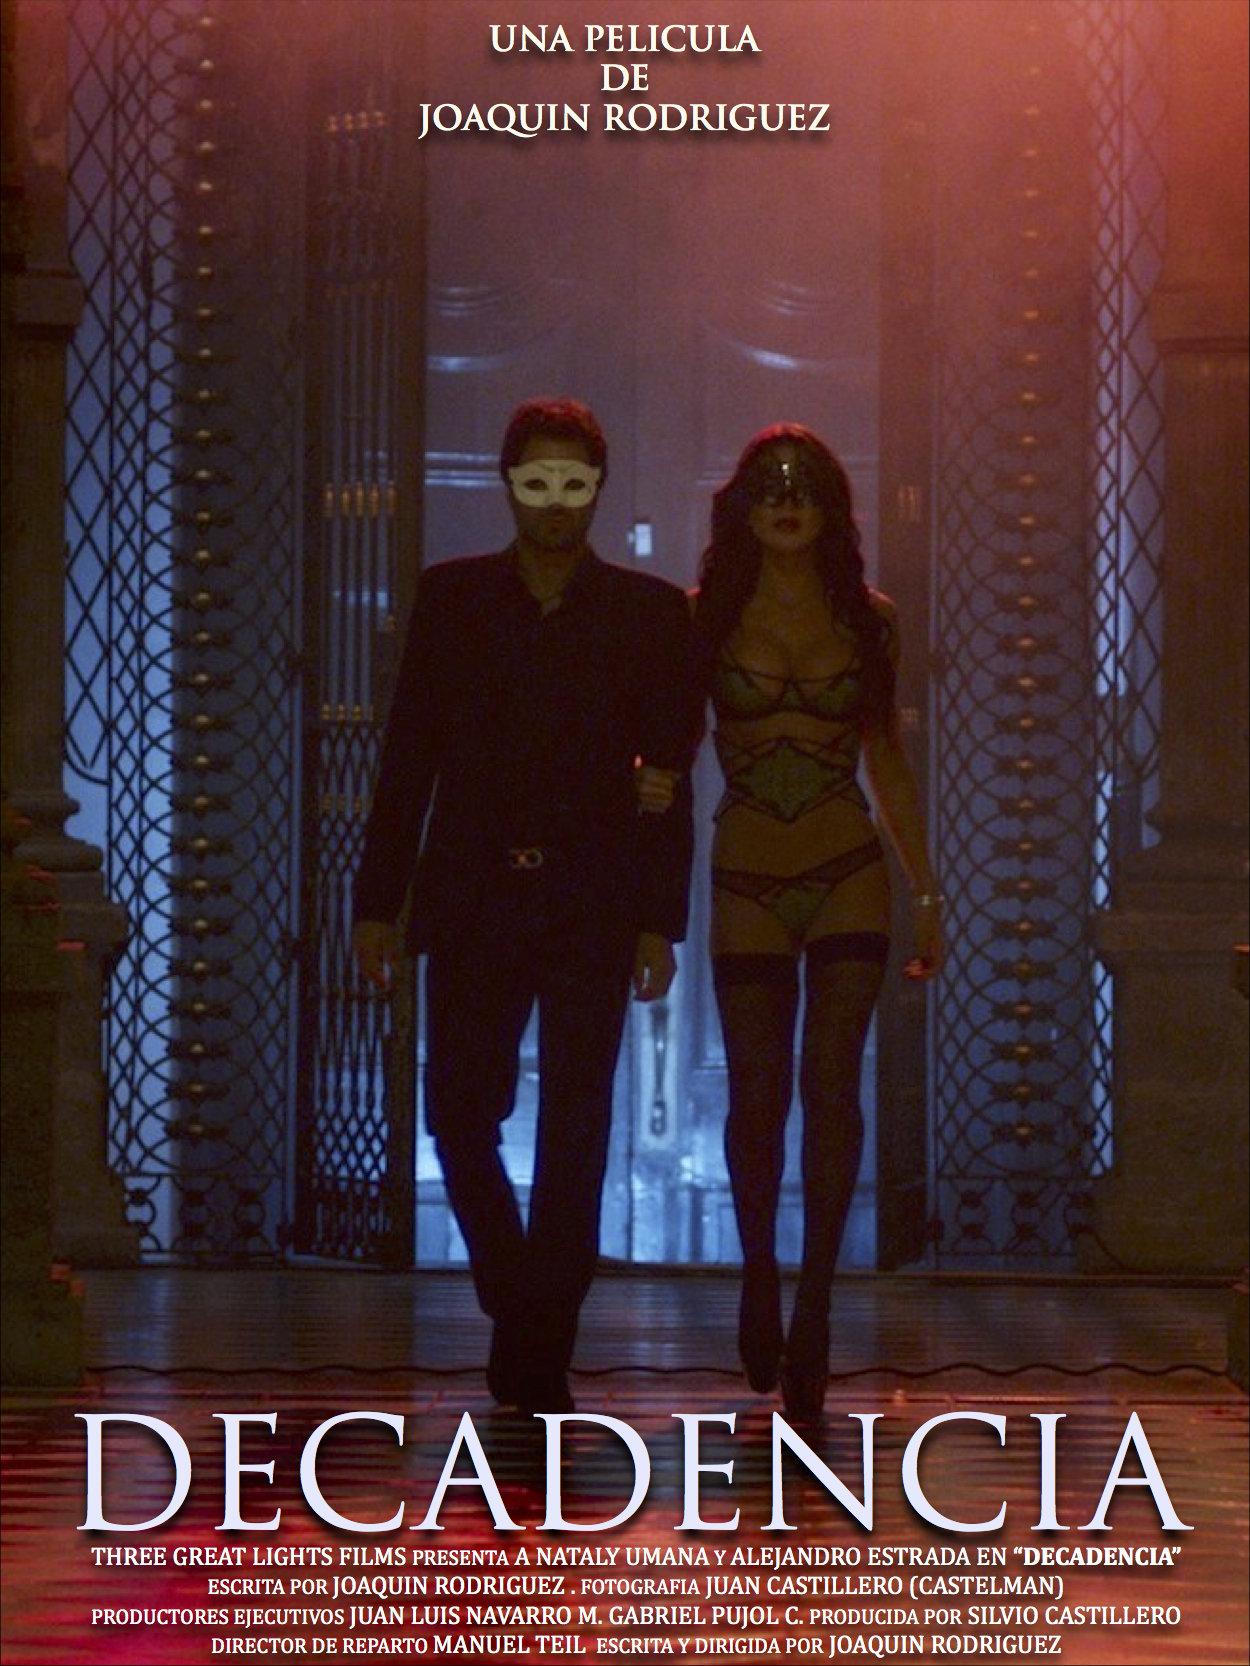 فيلم DECADENCIA 2015 مترجم للكبار فقط